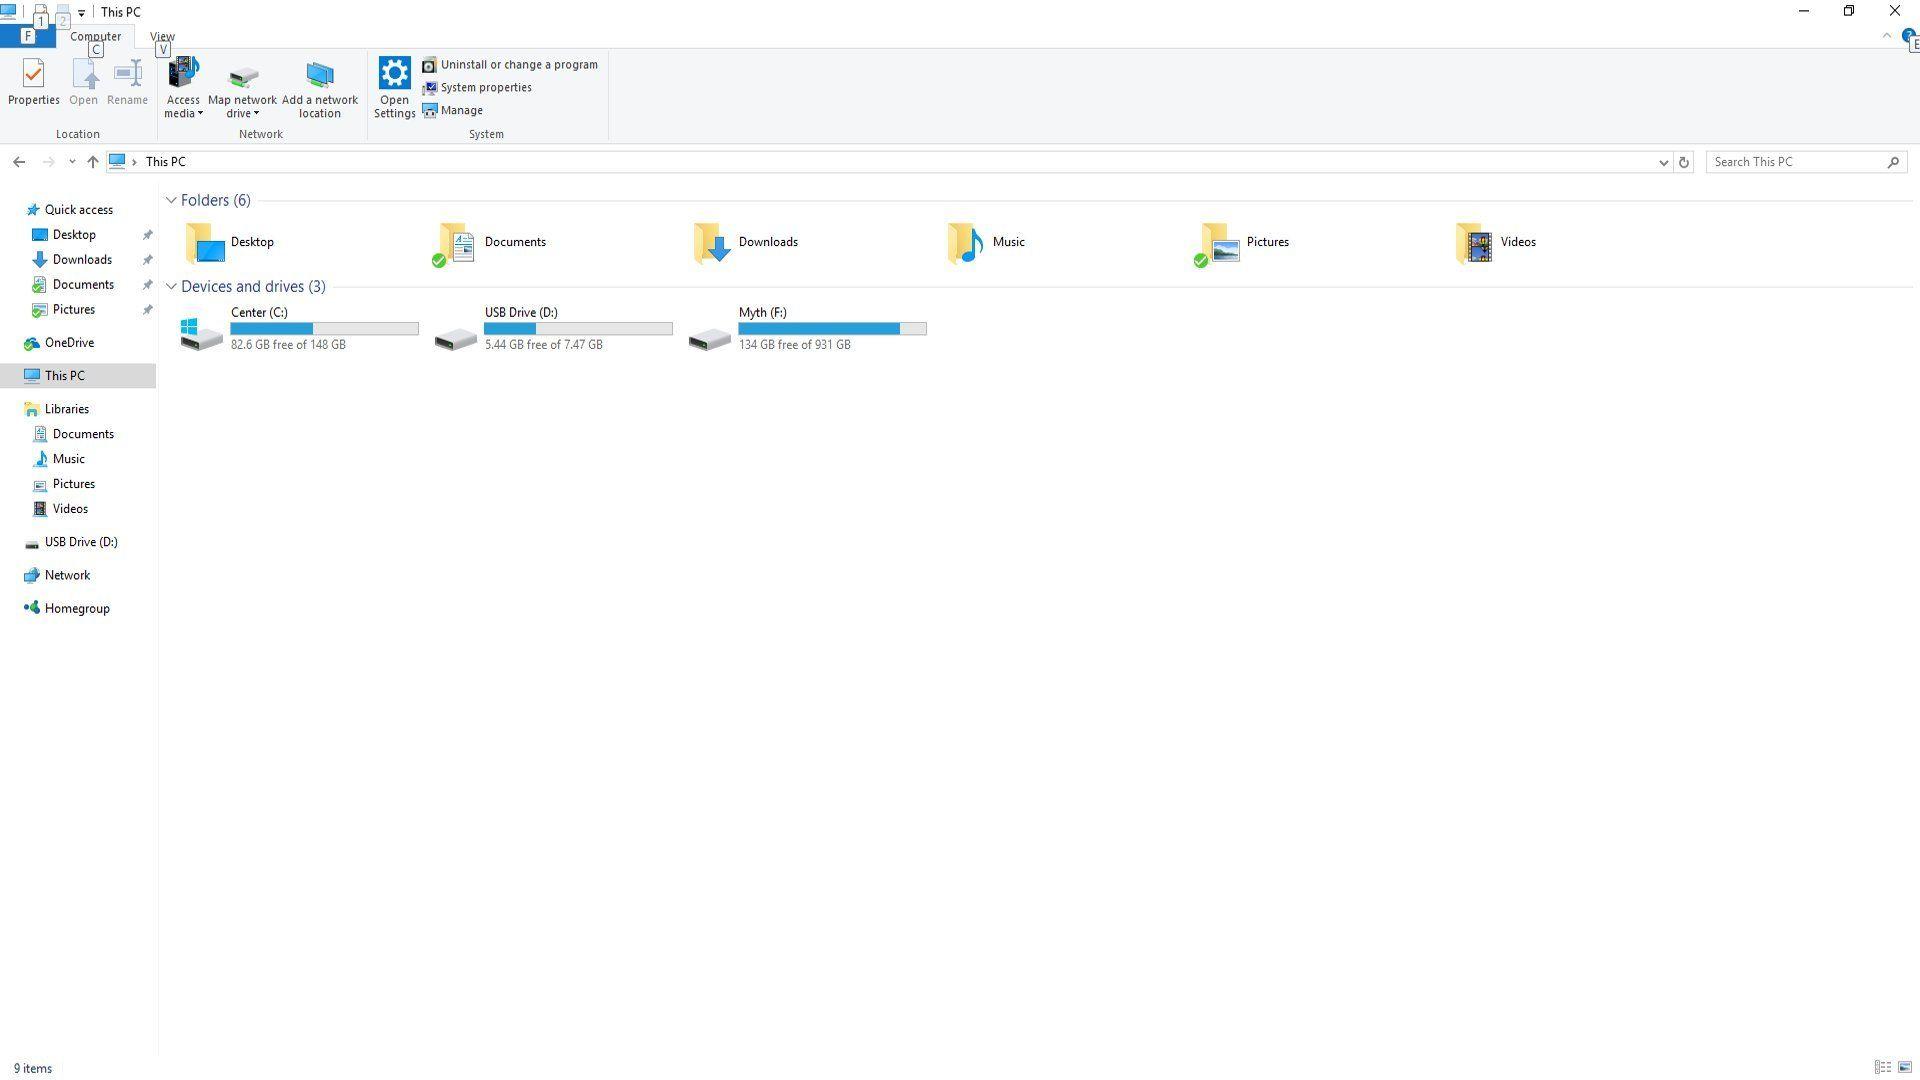 Windows 10 - File Explorer